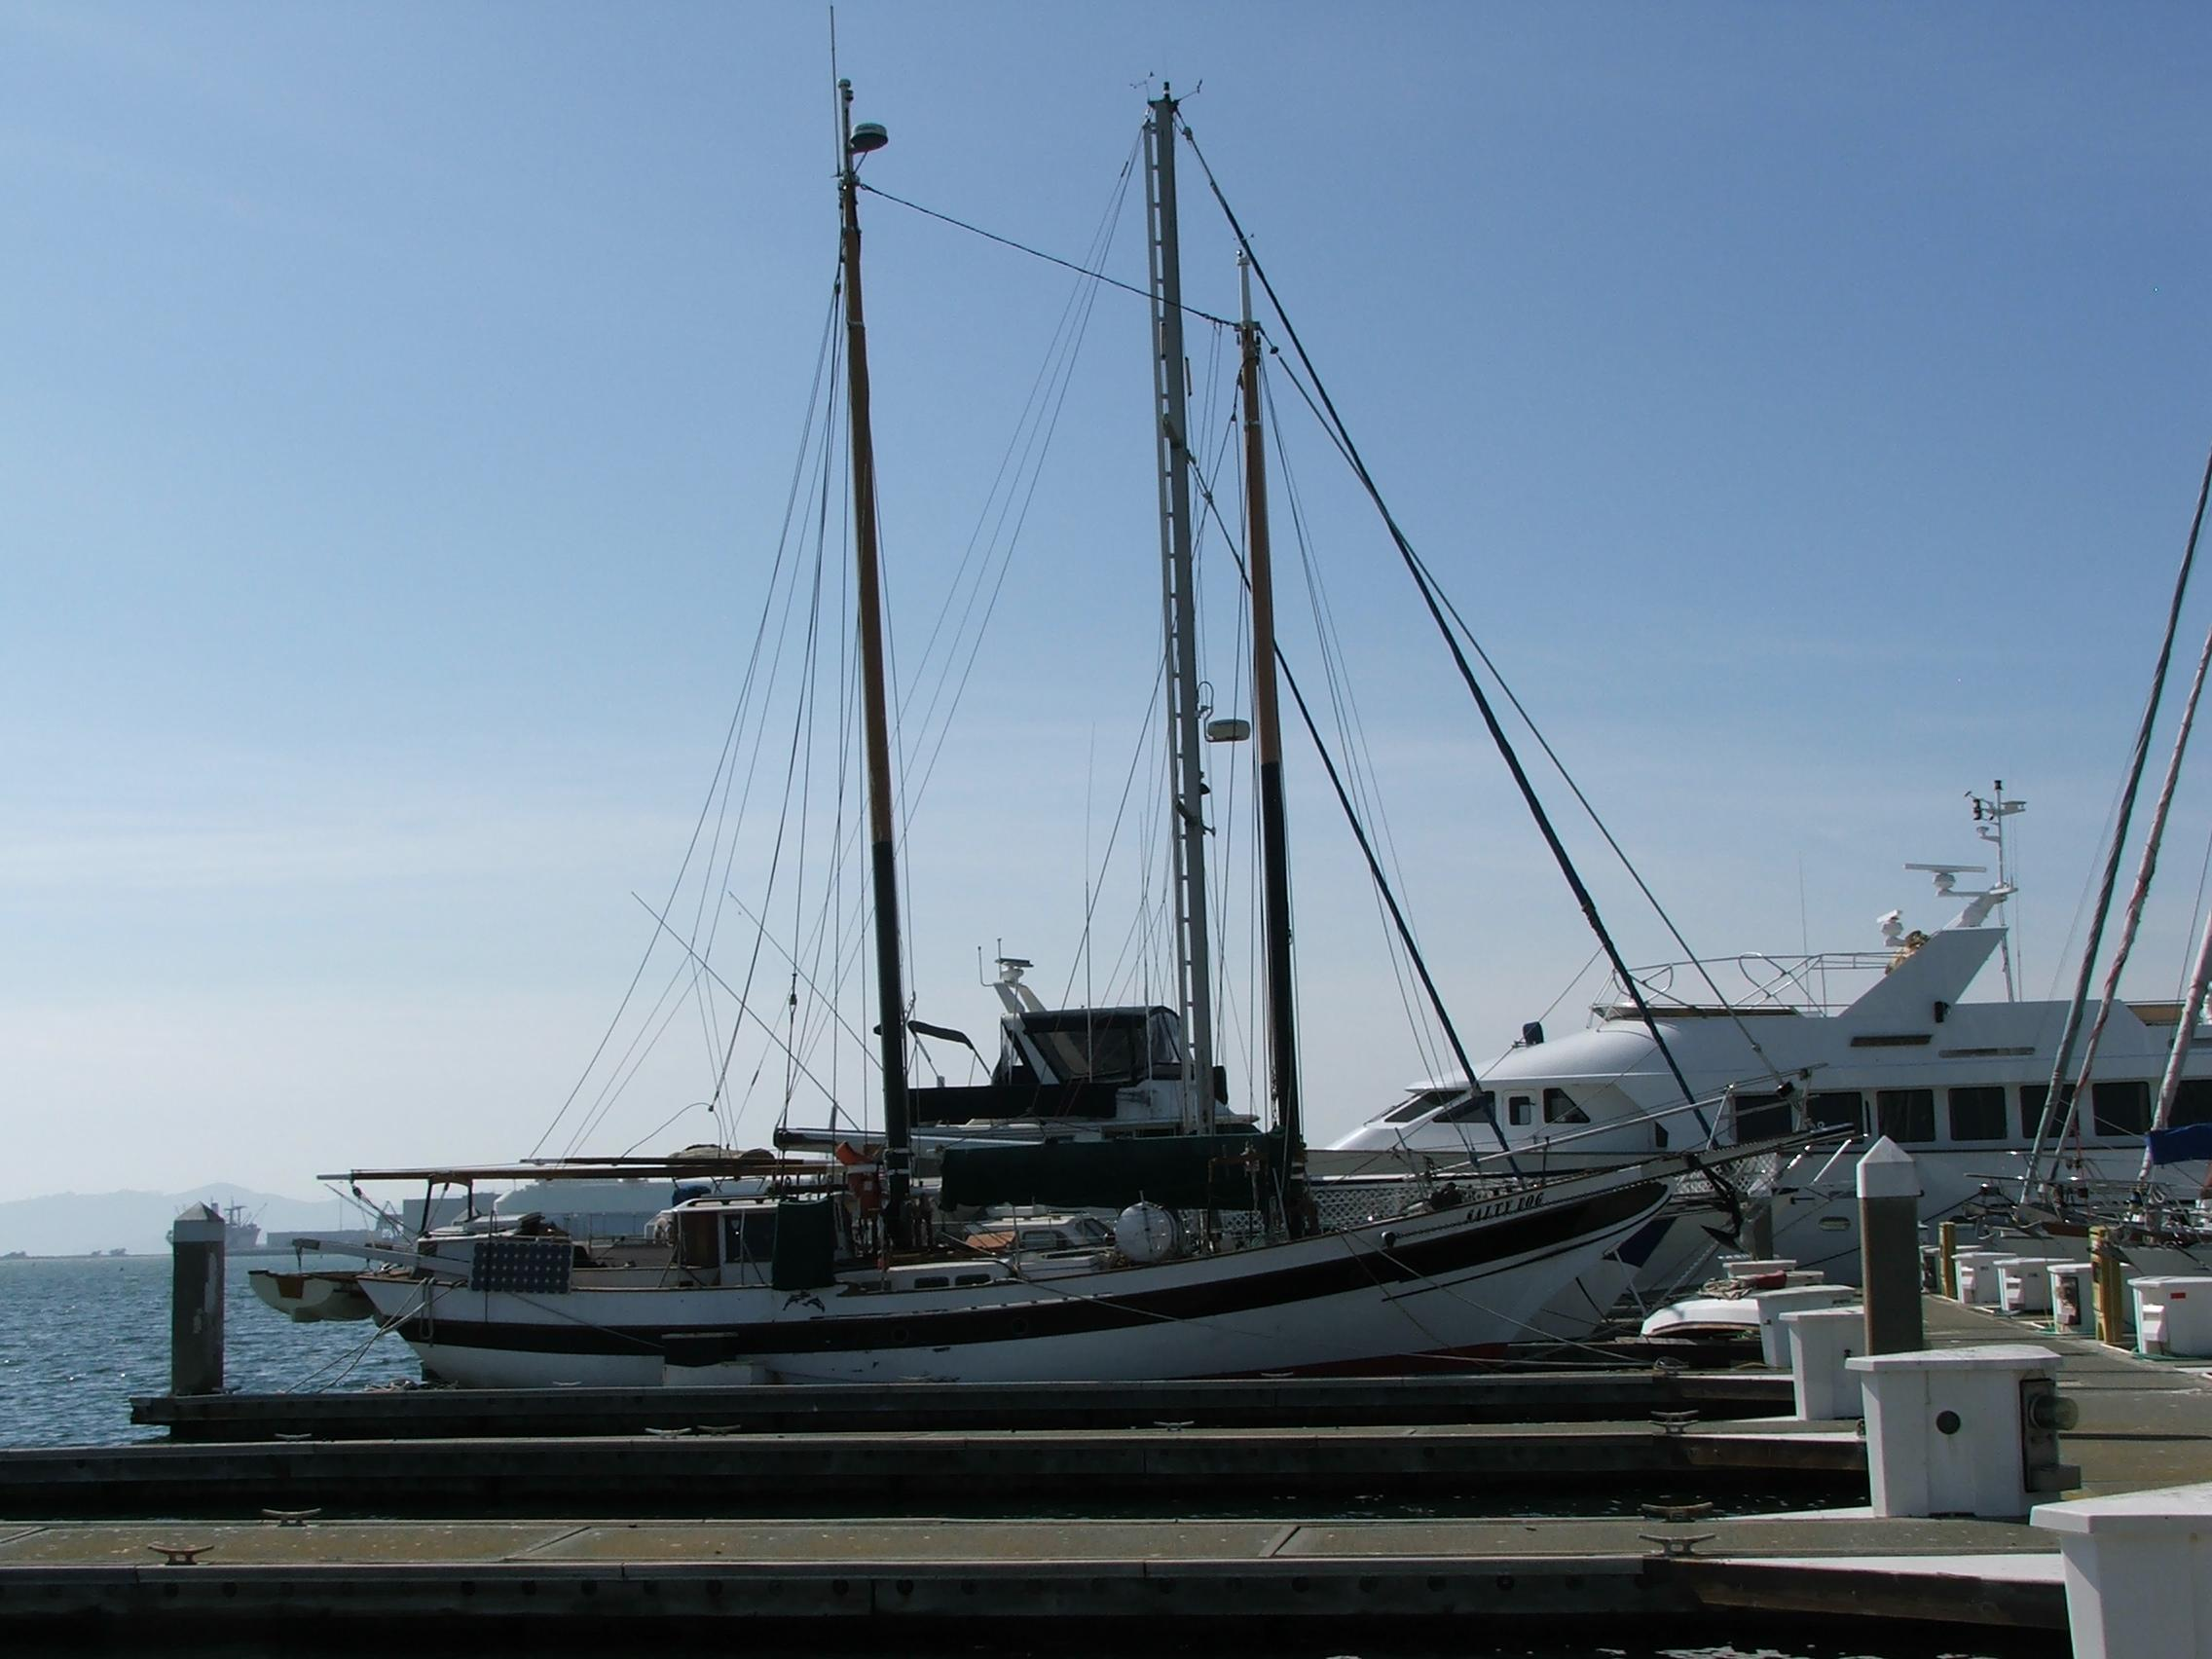 Schooner boat listings in ca for 68 garden design gaff rigged schooner